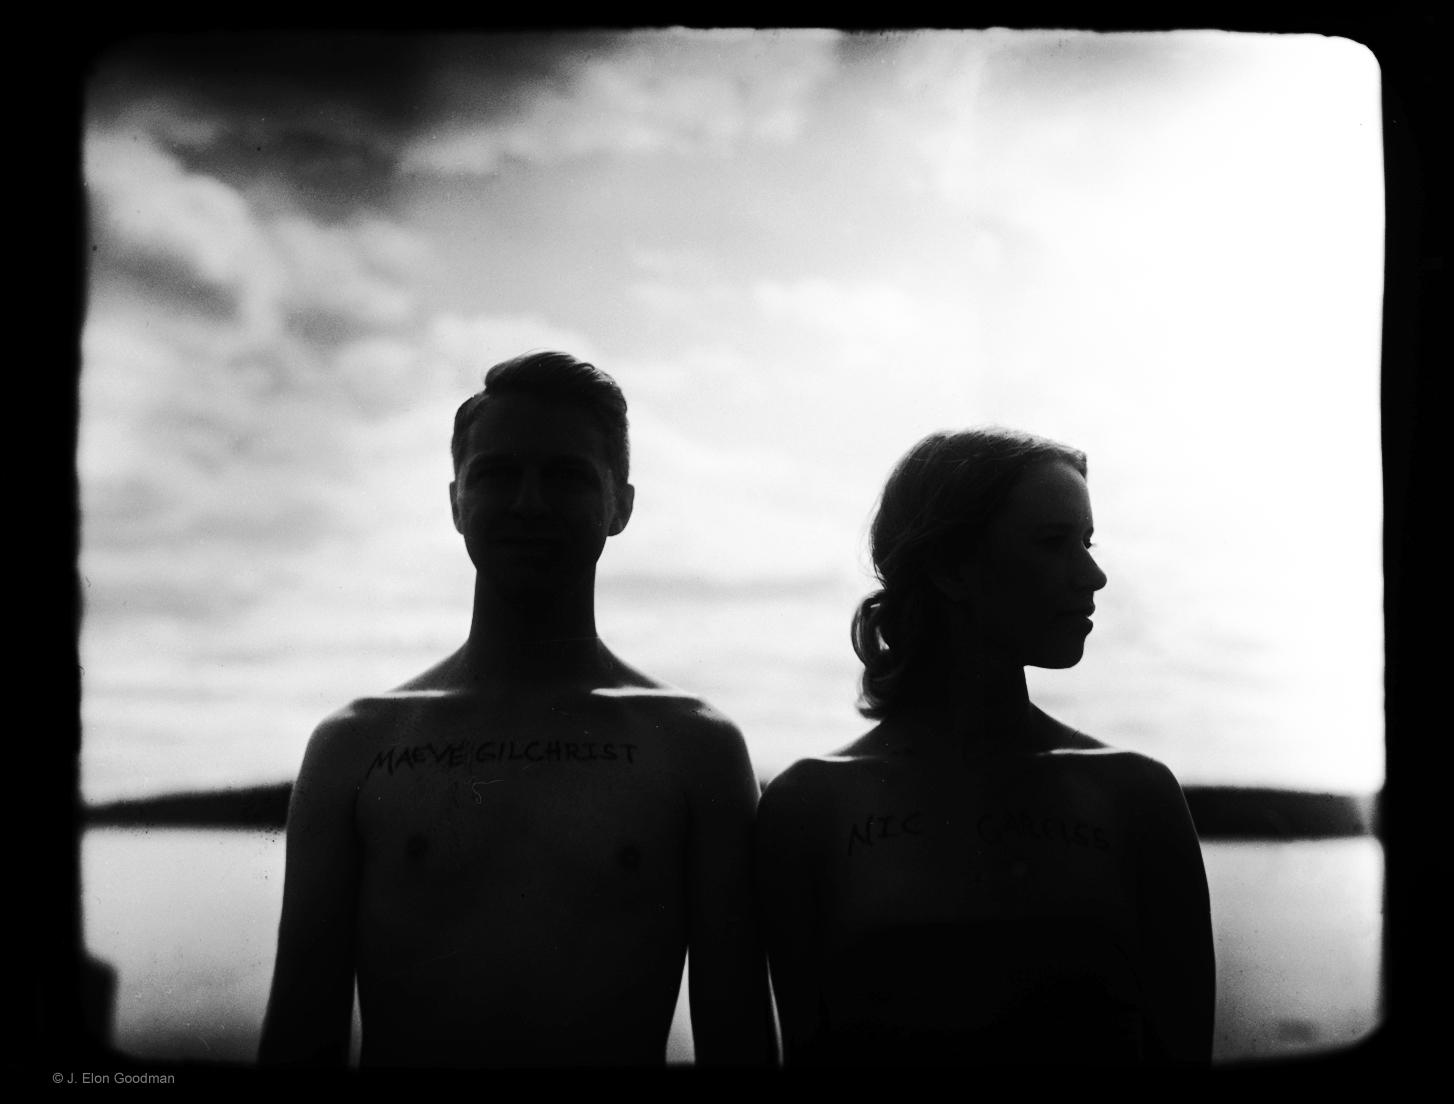 Nic Gareiss & Maeve Gilchrist